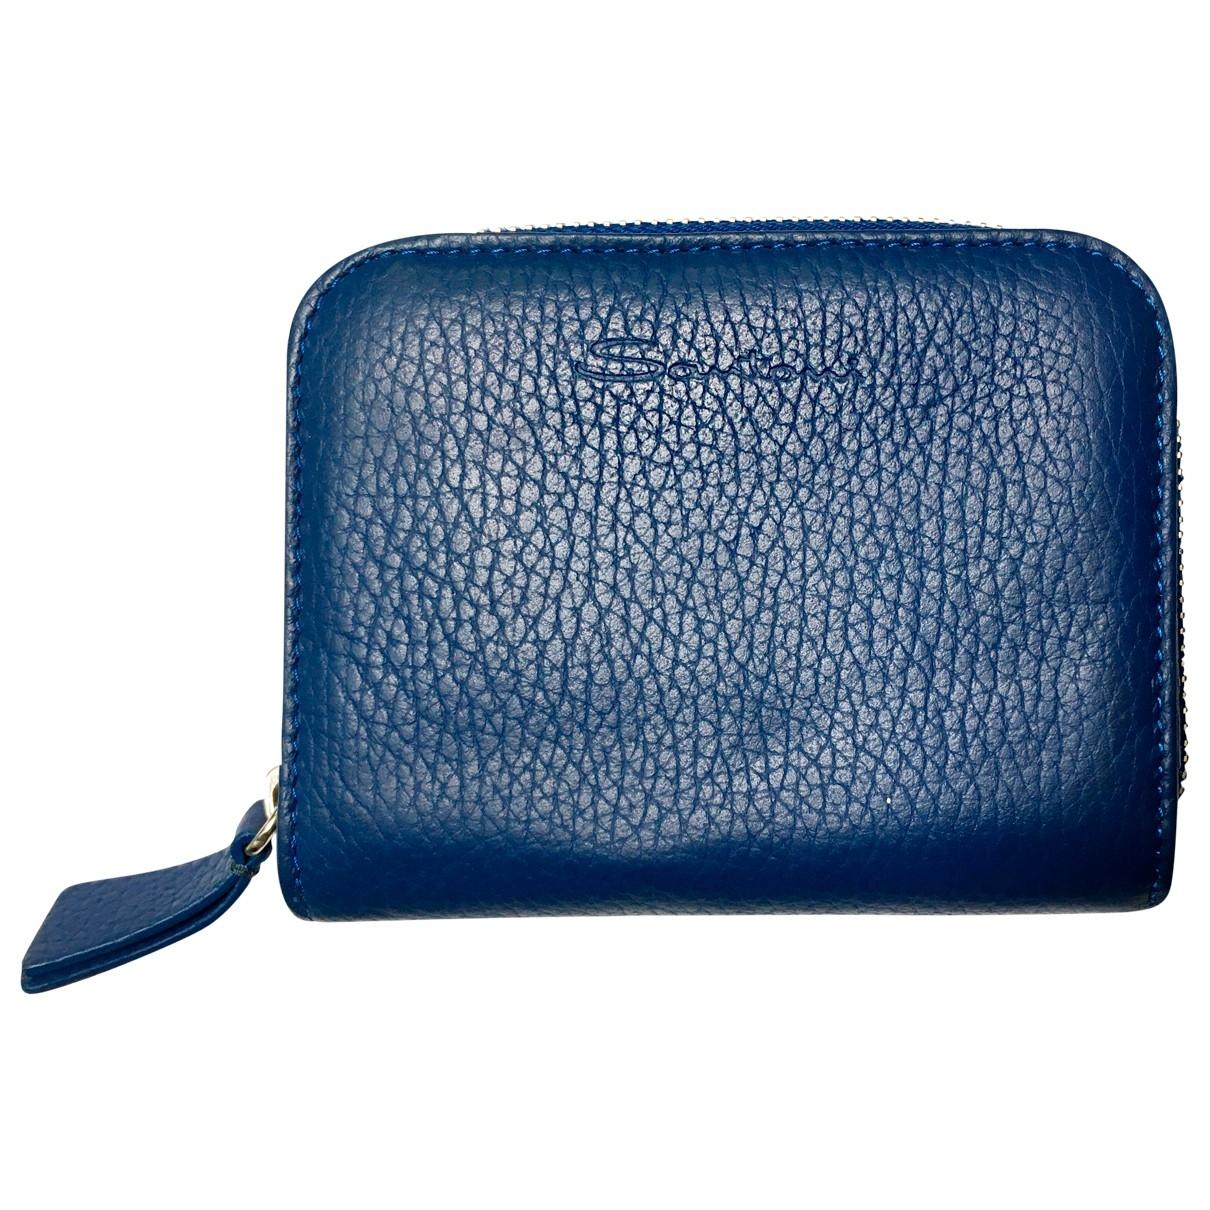 Santoni \N Kleinlederwaren in  Blau Leder